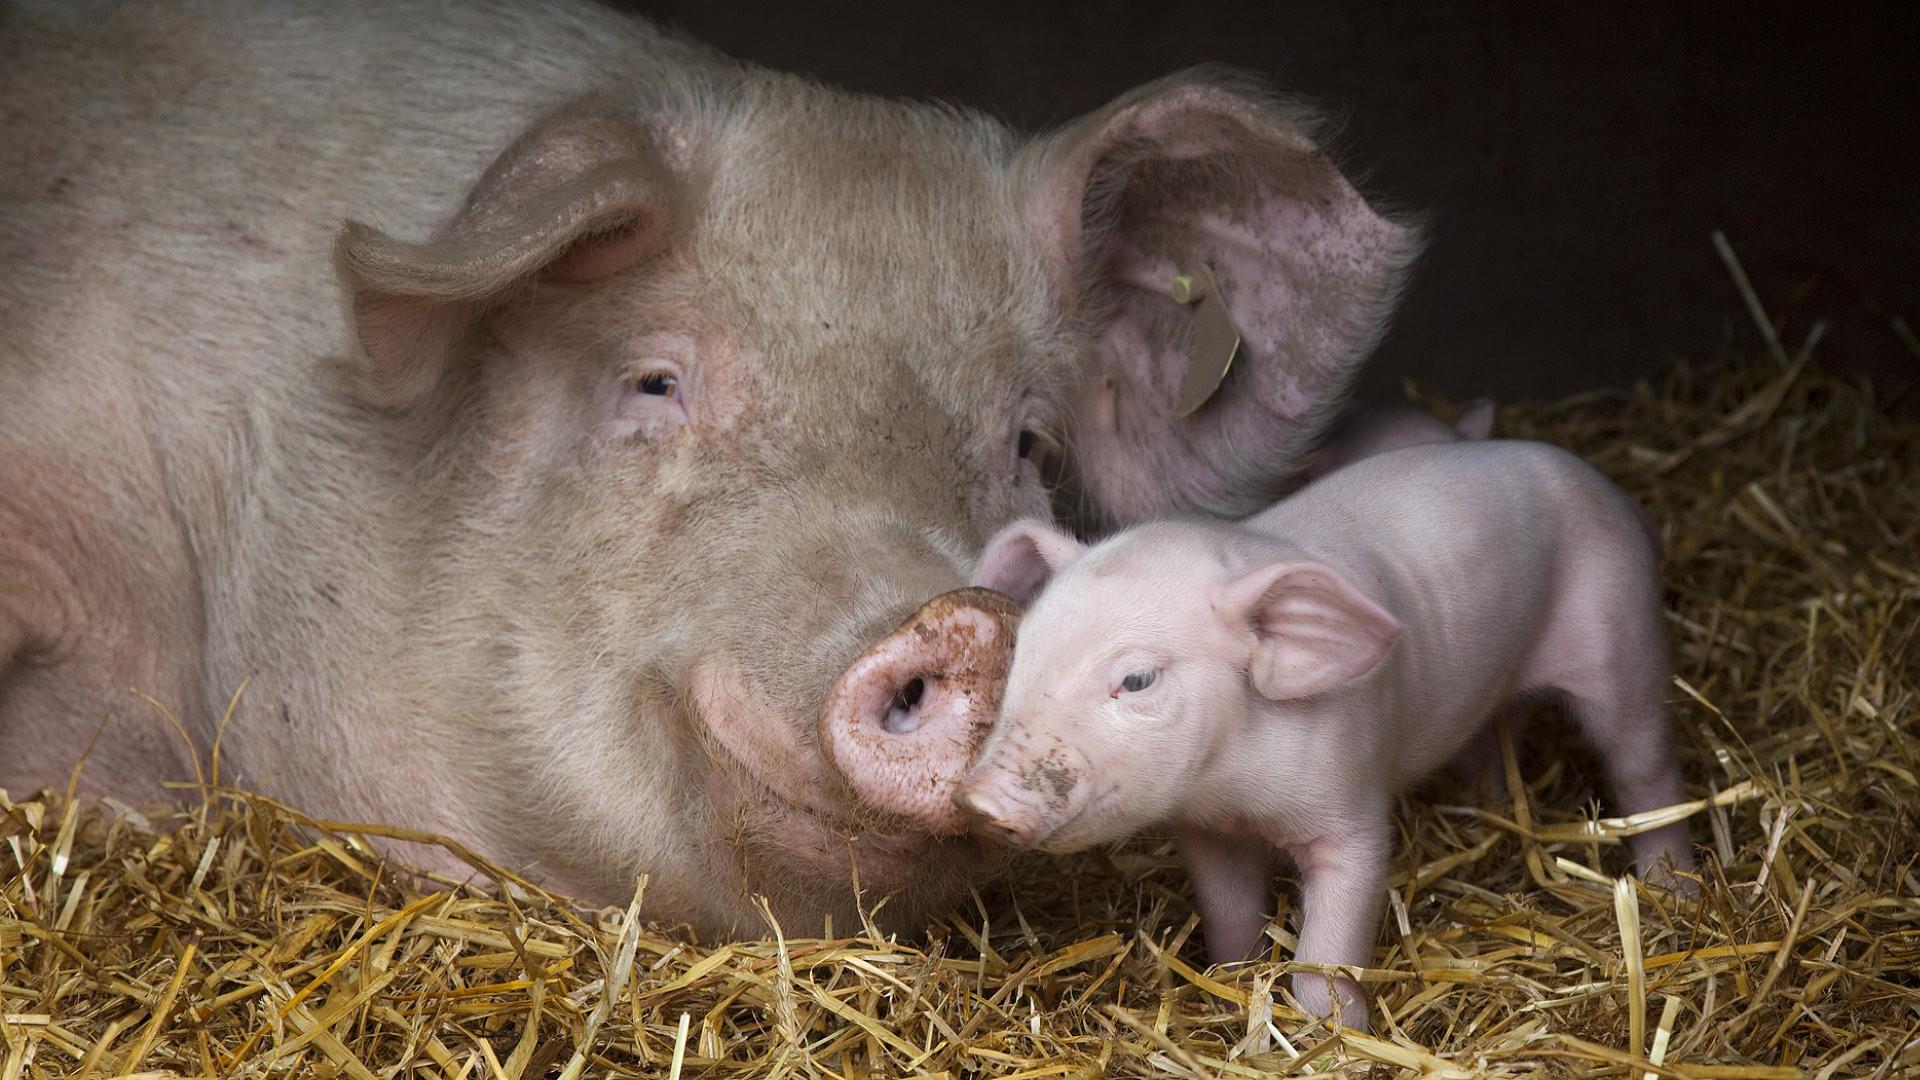 Res: 1920x1080, Animal - Pig Wallpaper